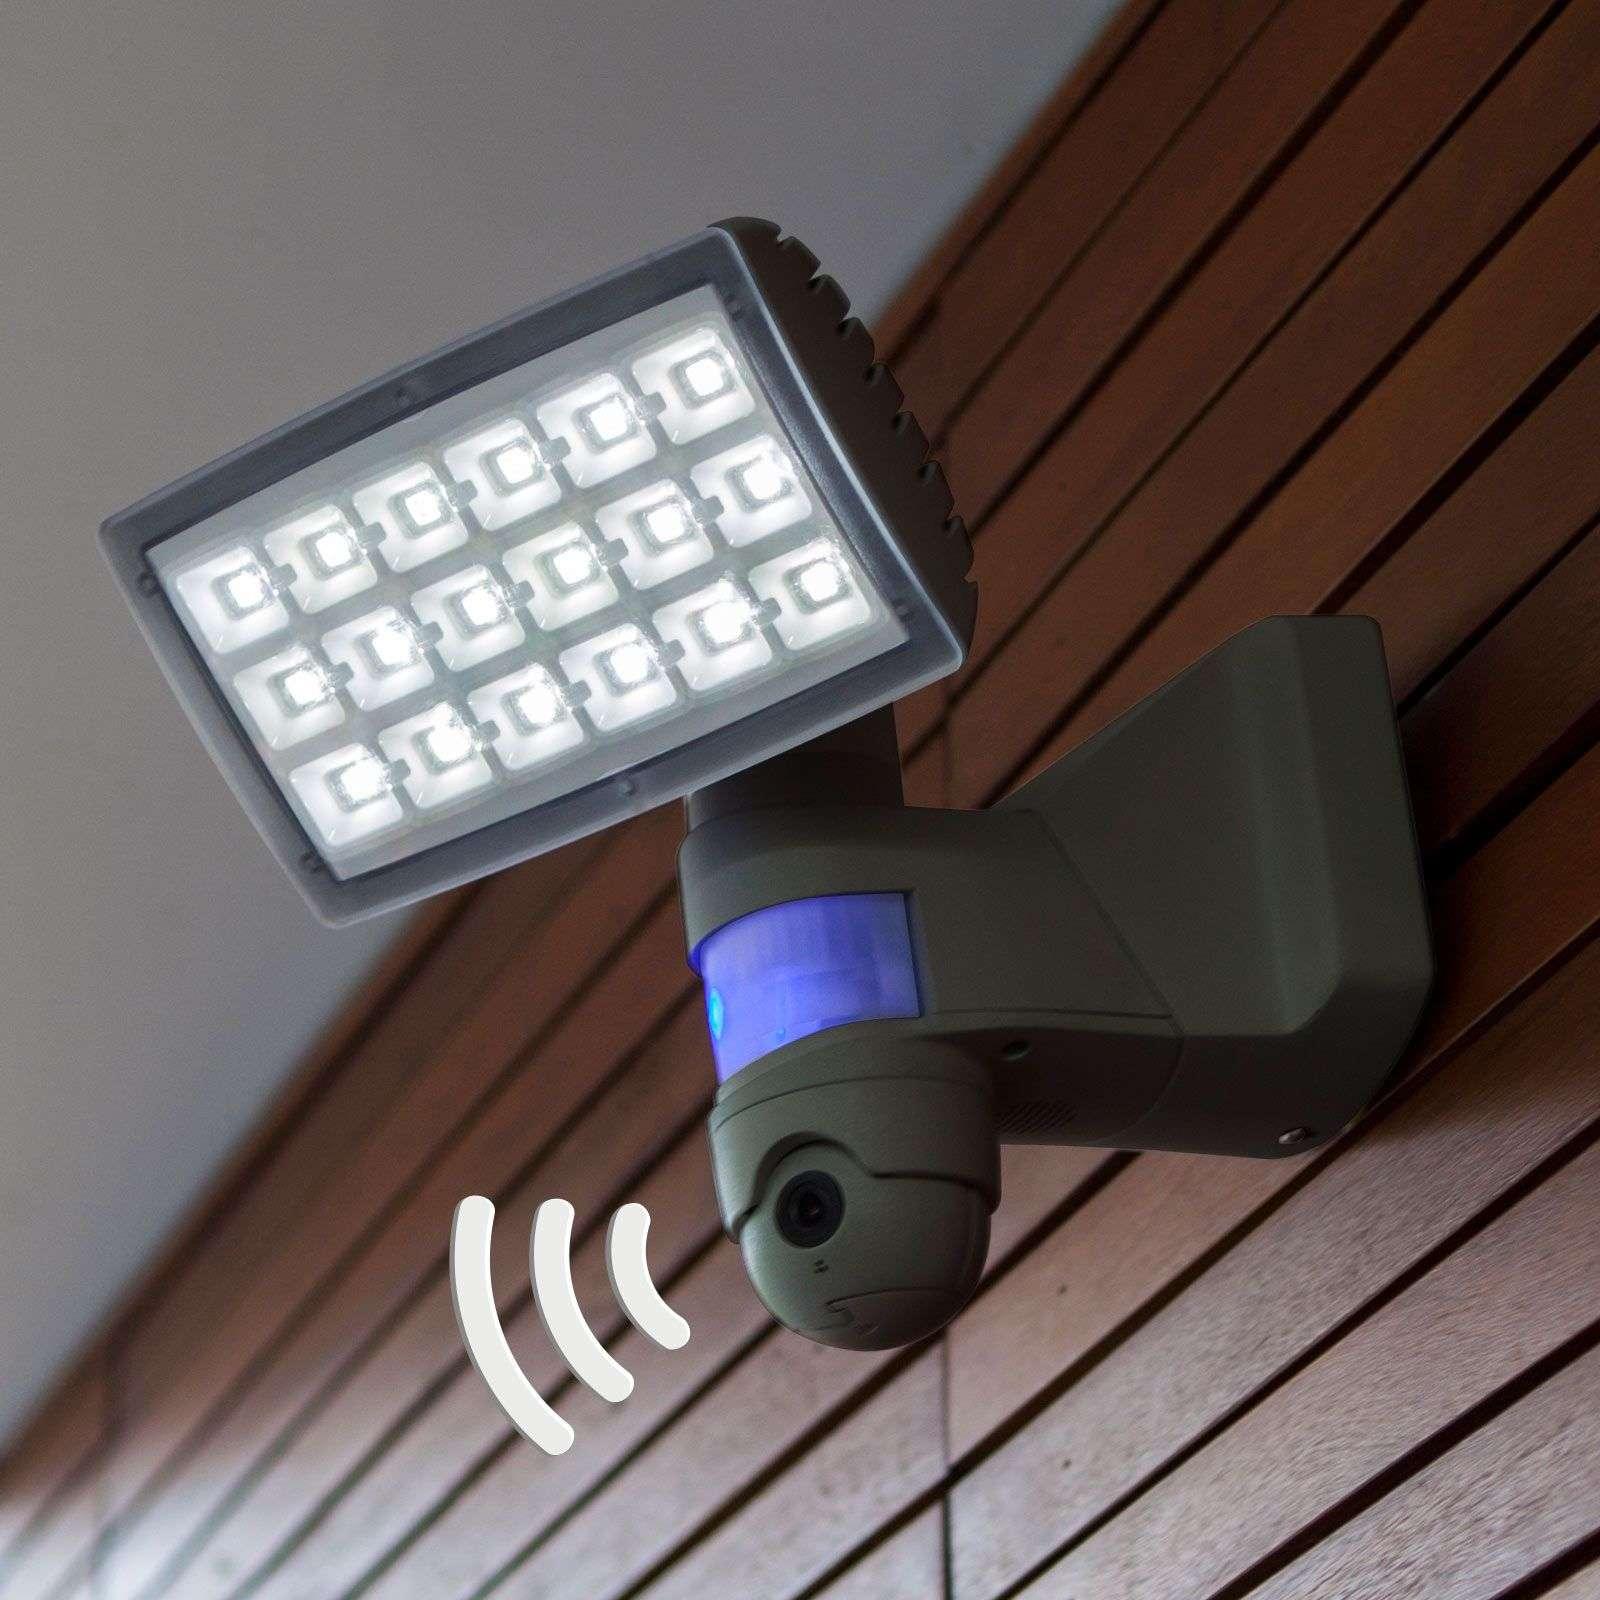 Peri Cam LED outdoor spotlight with camera/sensor-3006508-31  sc 1 st  Lights.ie & Peri Cam LED outdoor spotlight with camera/sensor | Lights.ie